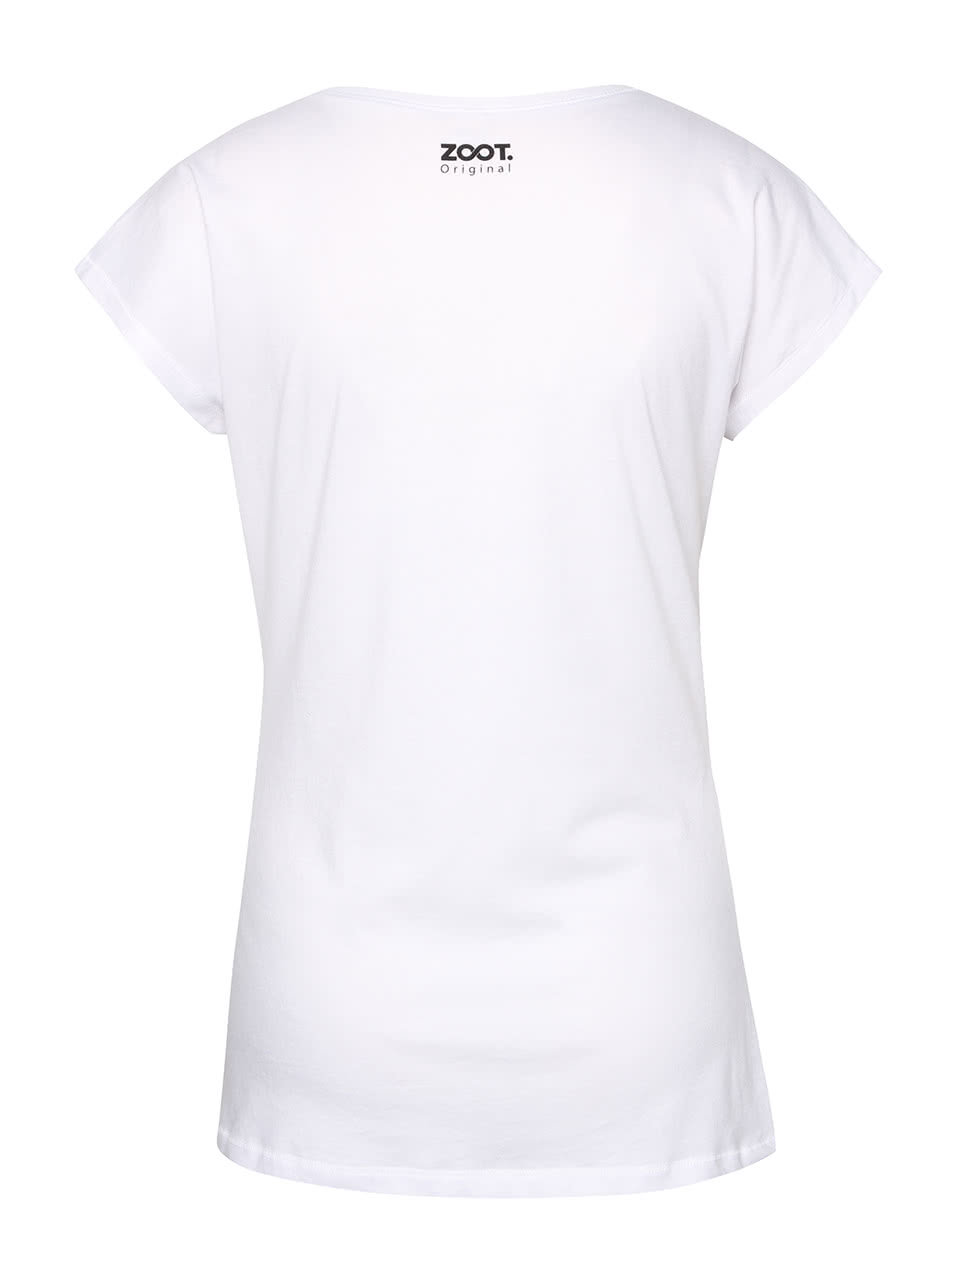 0b7c99cfbfc Bílé dámské tričko s rukou ZOOT Originál Skate ...